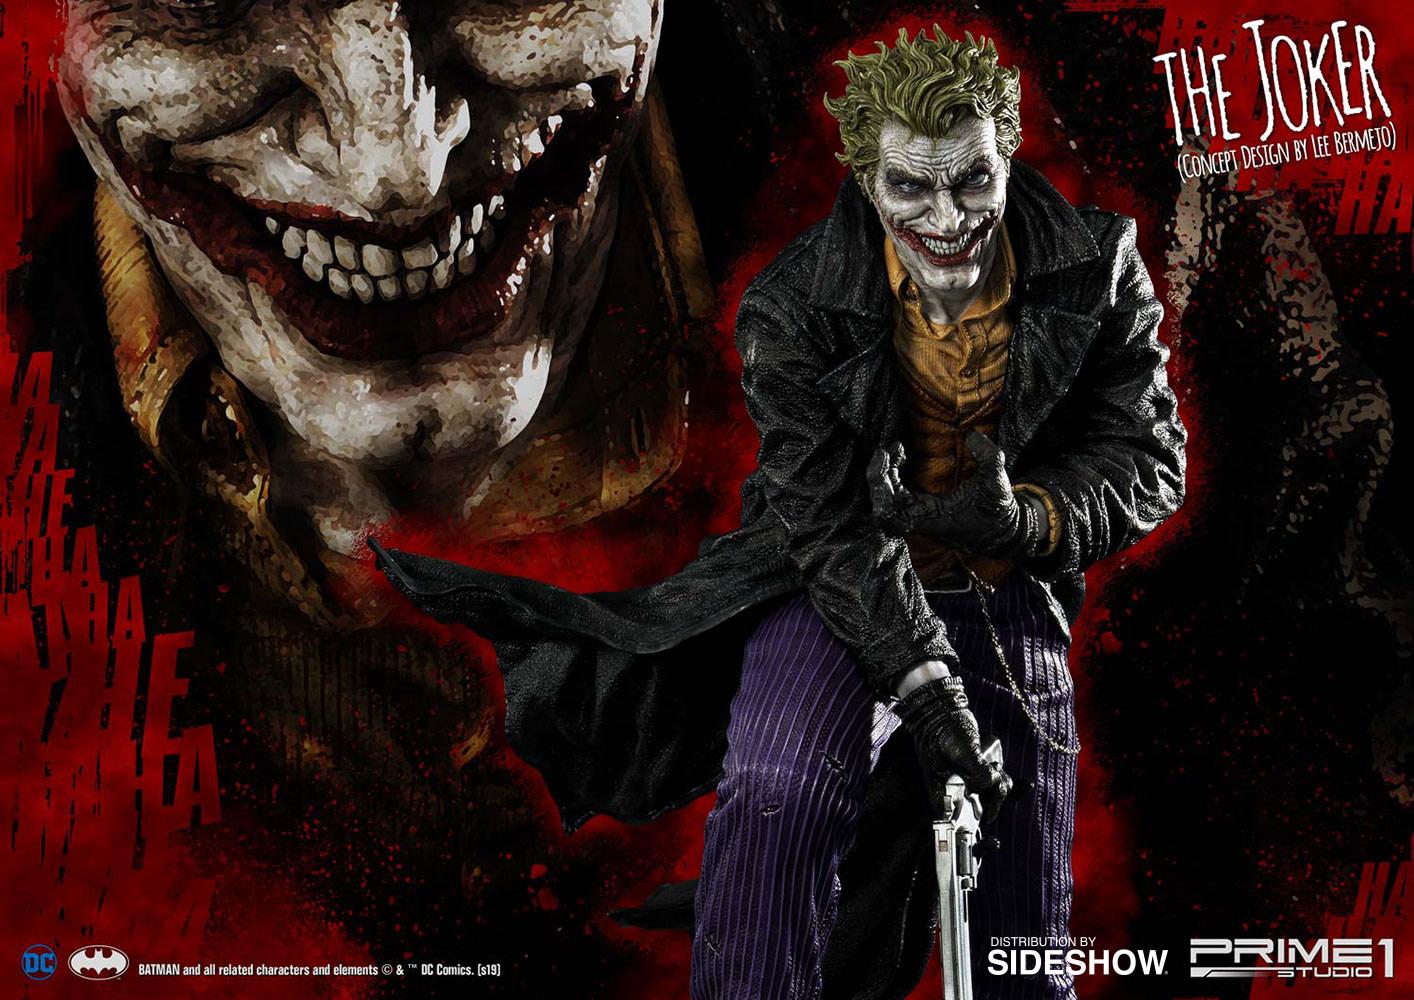 the-joker-concept-design-by-lee-bermejo_dc-comics_gallery_5e97bcfe6d263